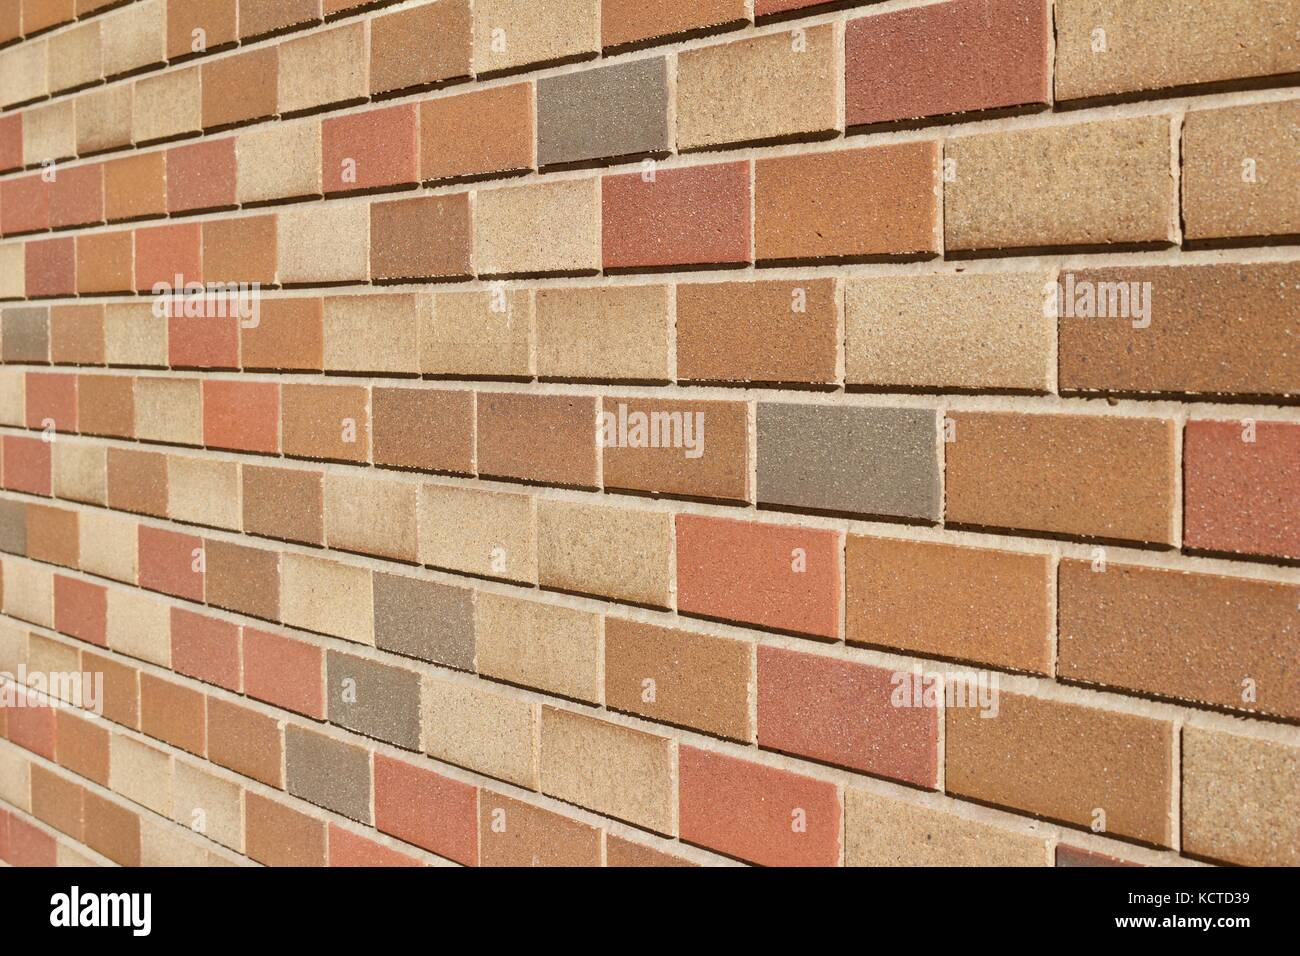 brick background 39 - photo #19